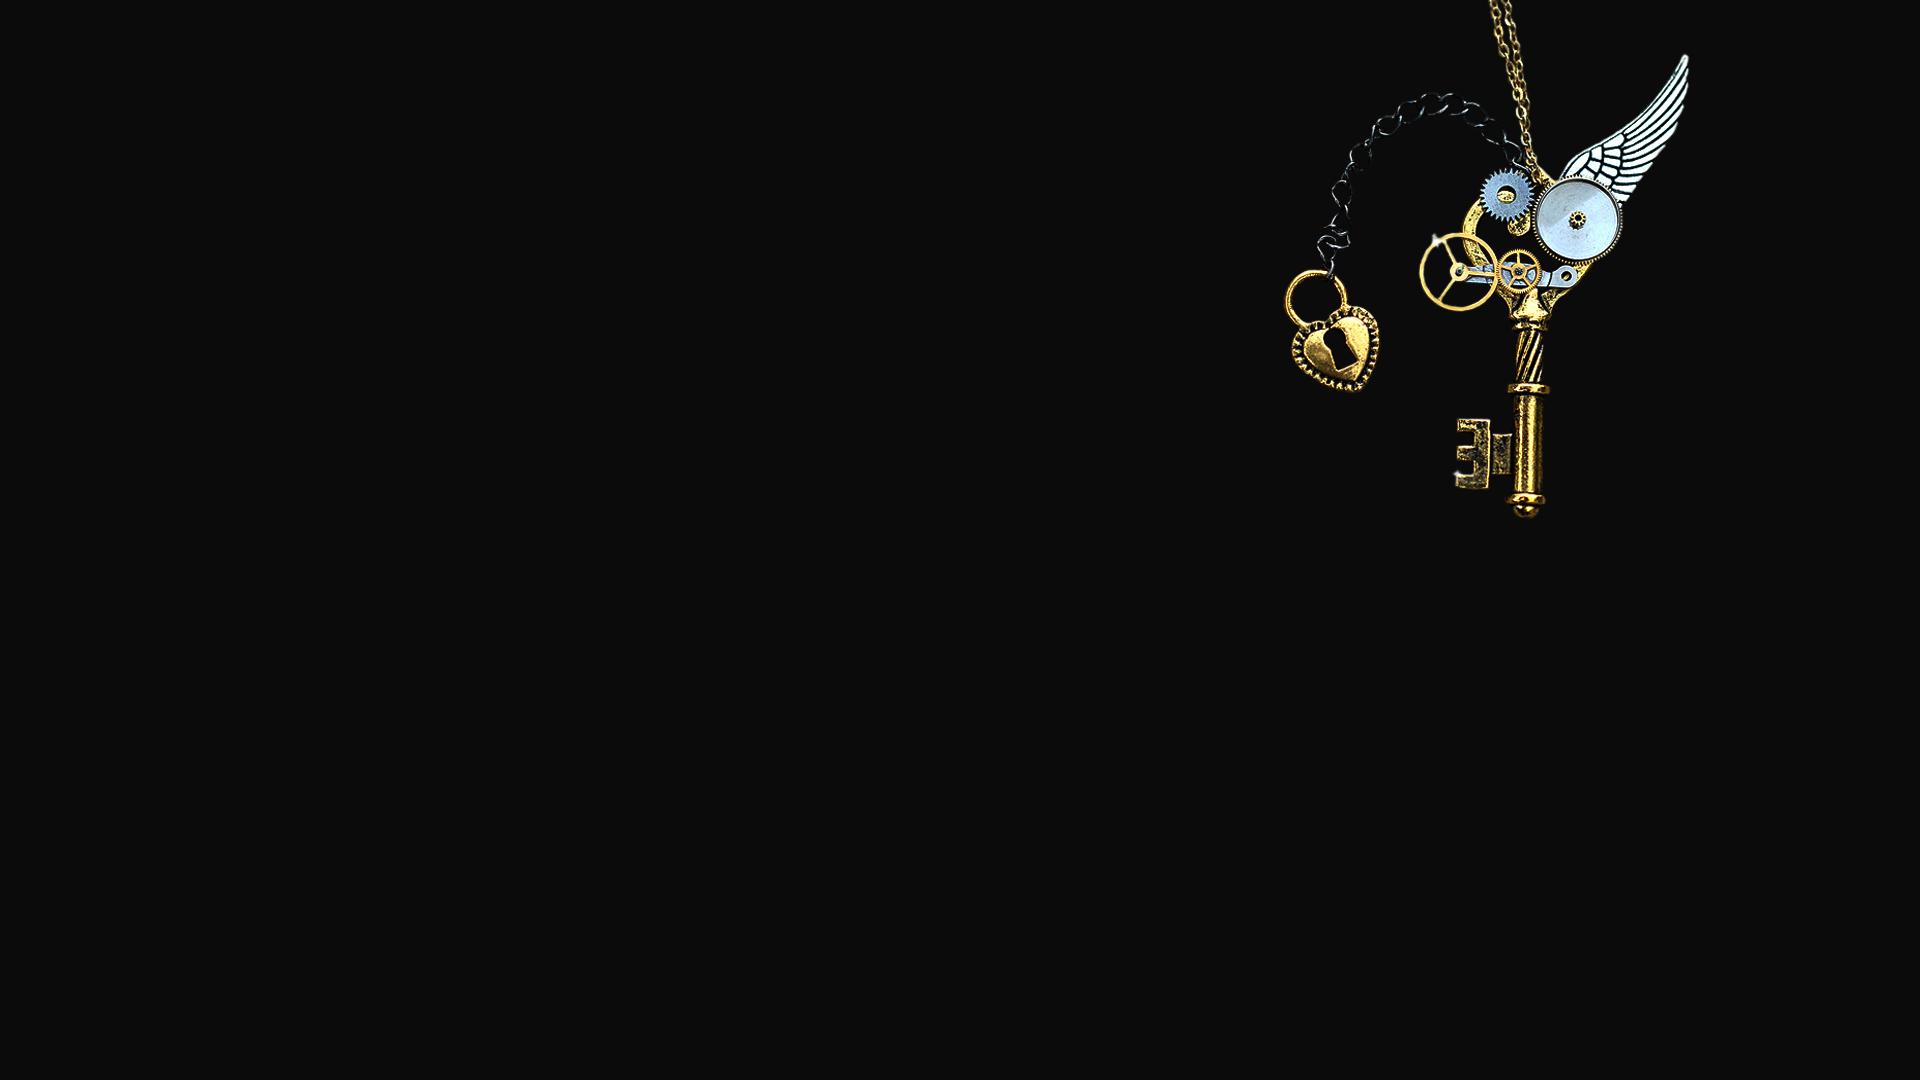 Steampunk HD Widescreen Wallpapers - WallpaperSafari